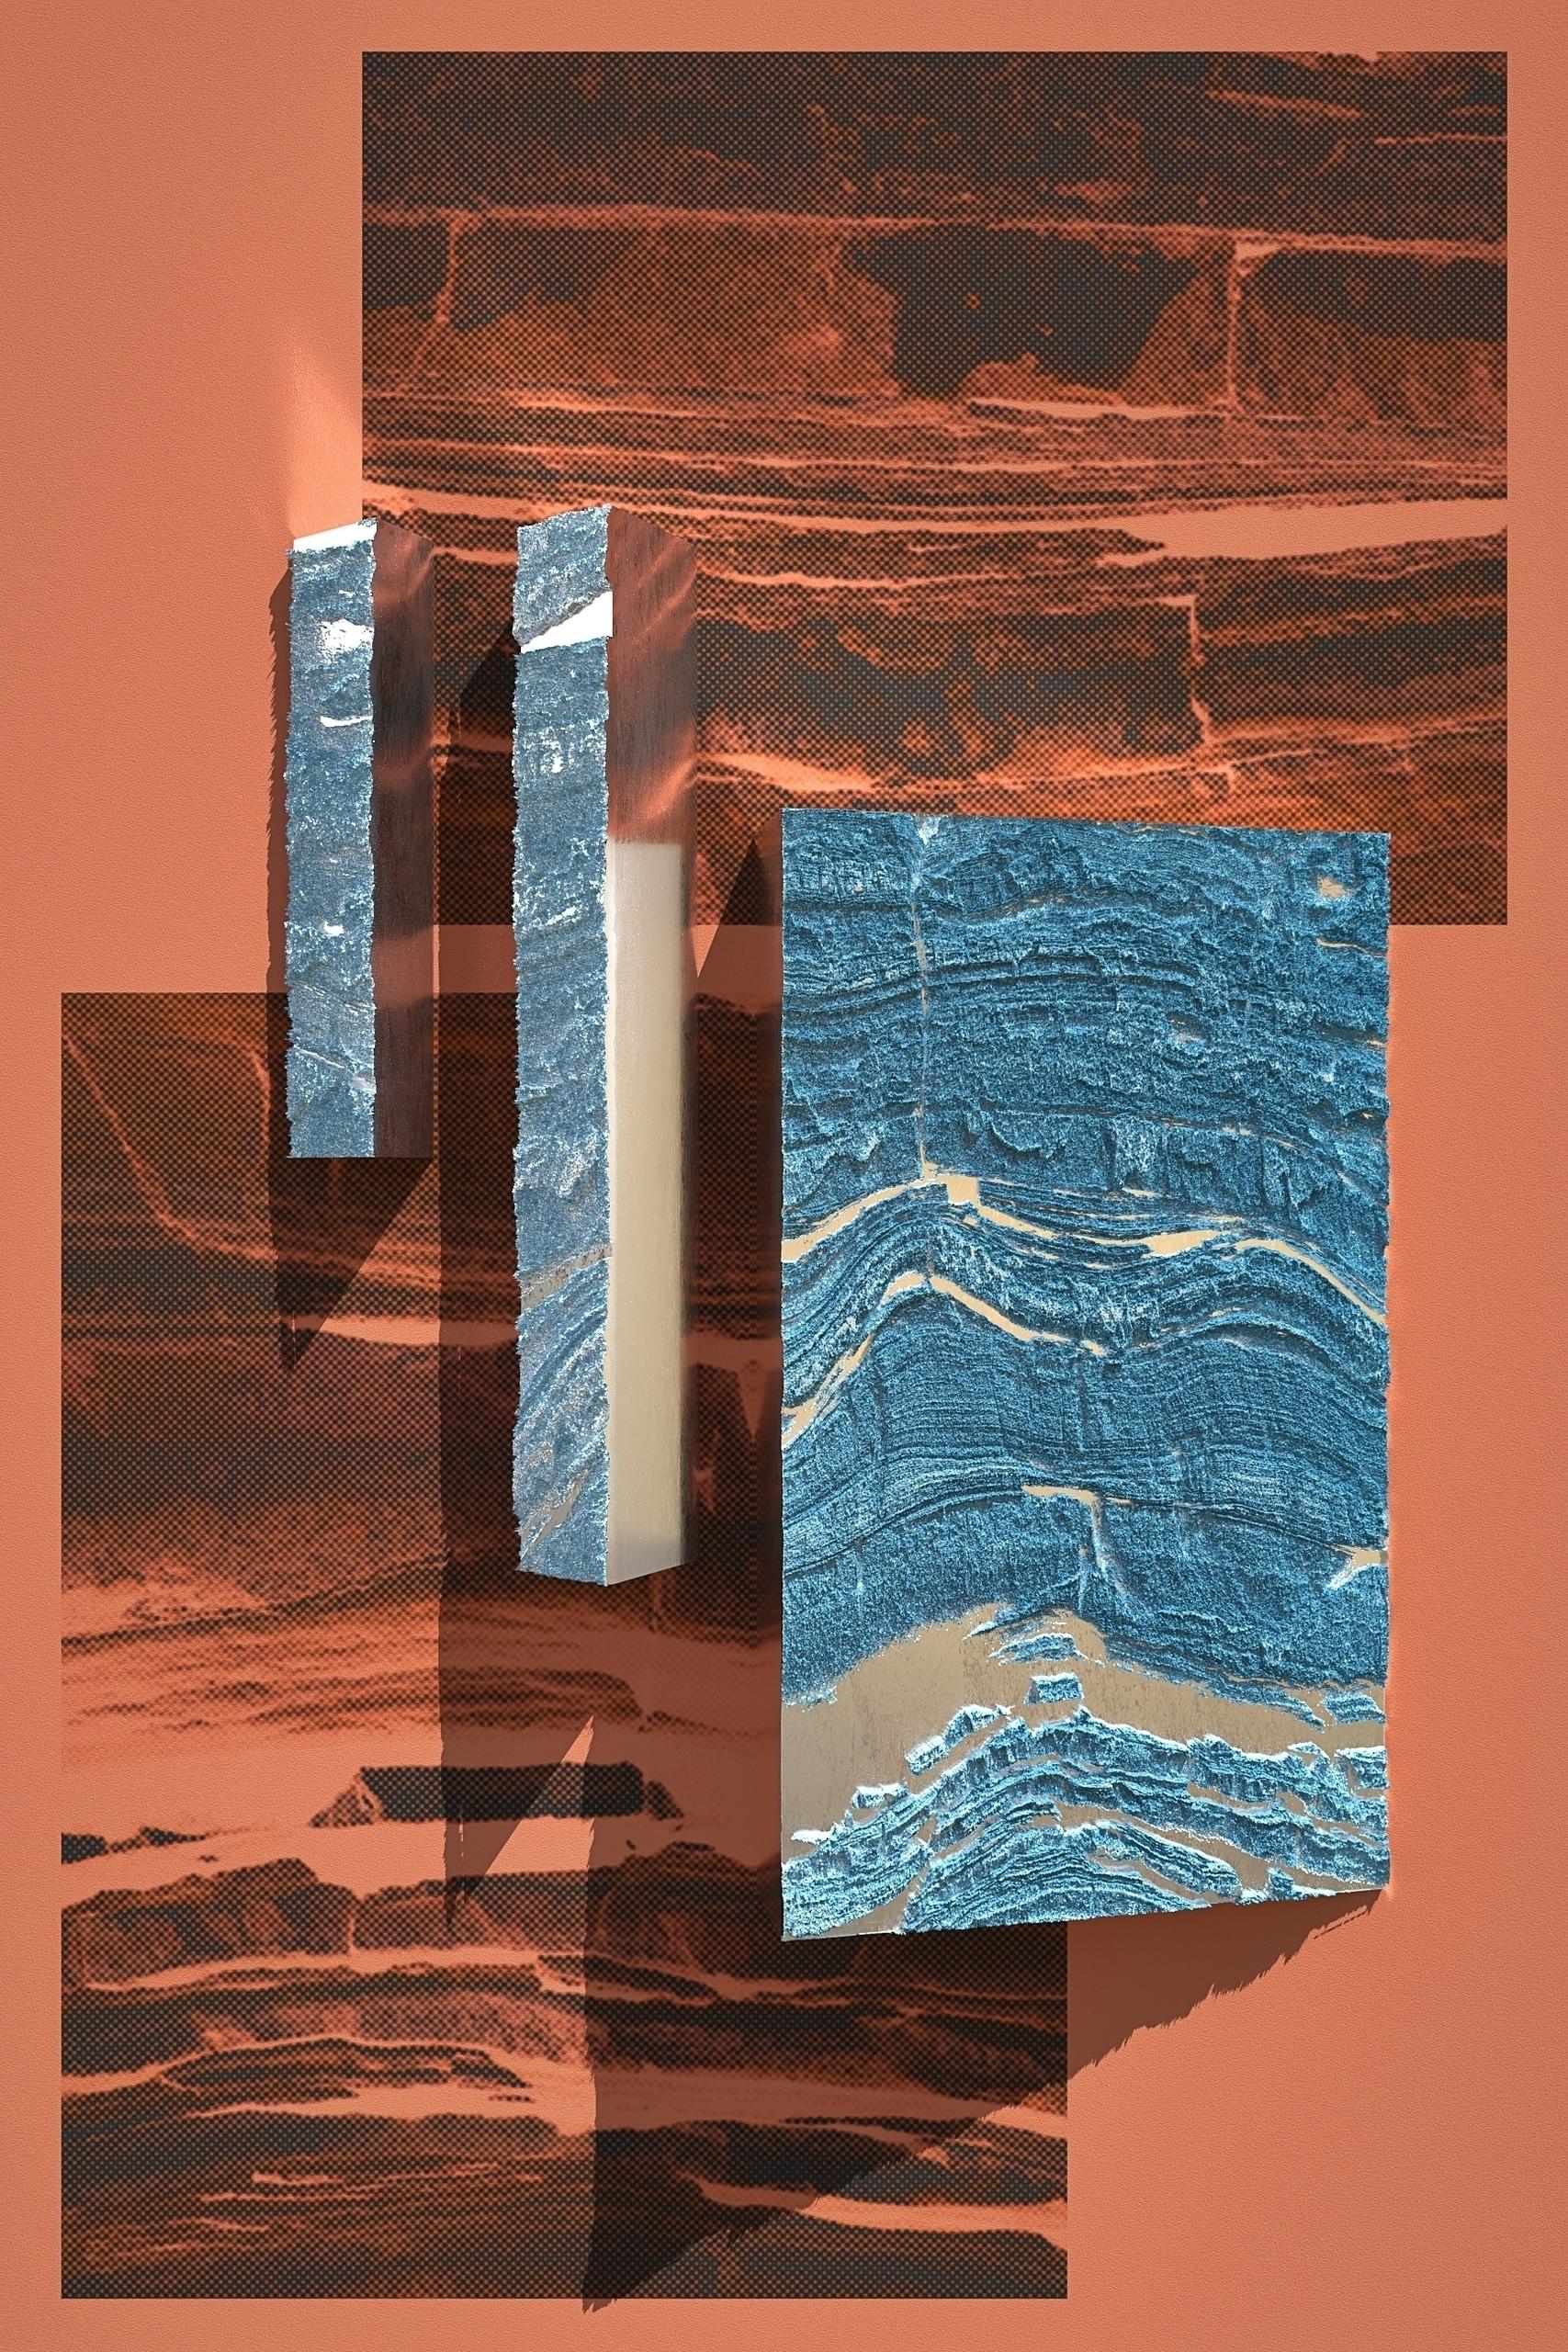 Rock Steel - Poster, 2D, 3D, Illustration - aaaronkaufman | ello